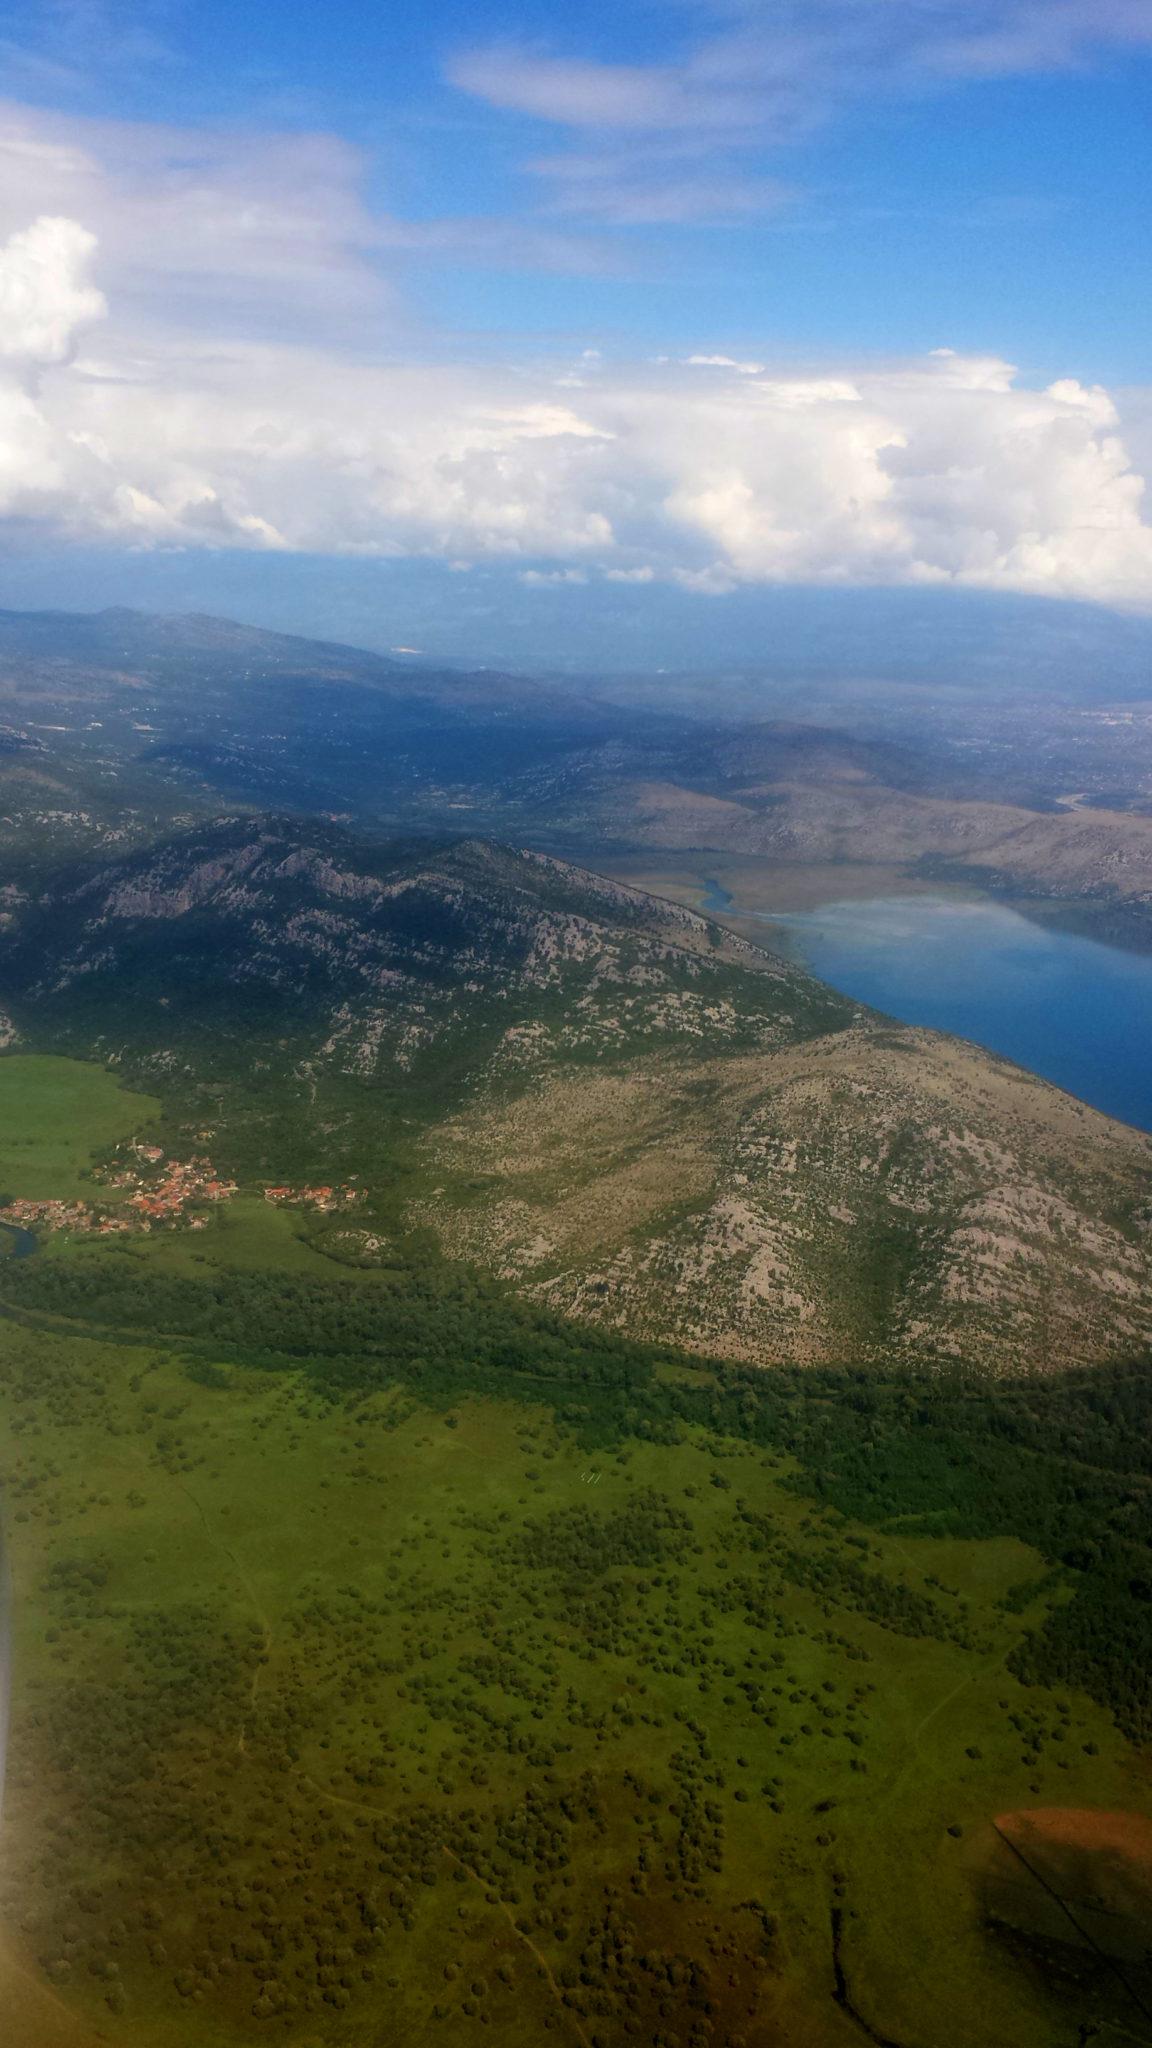 Hema_Montenegro_vue_ciel_sky_view_skadar_lake5